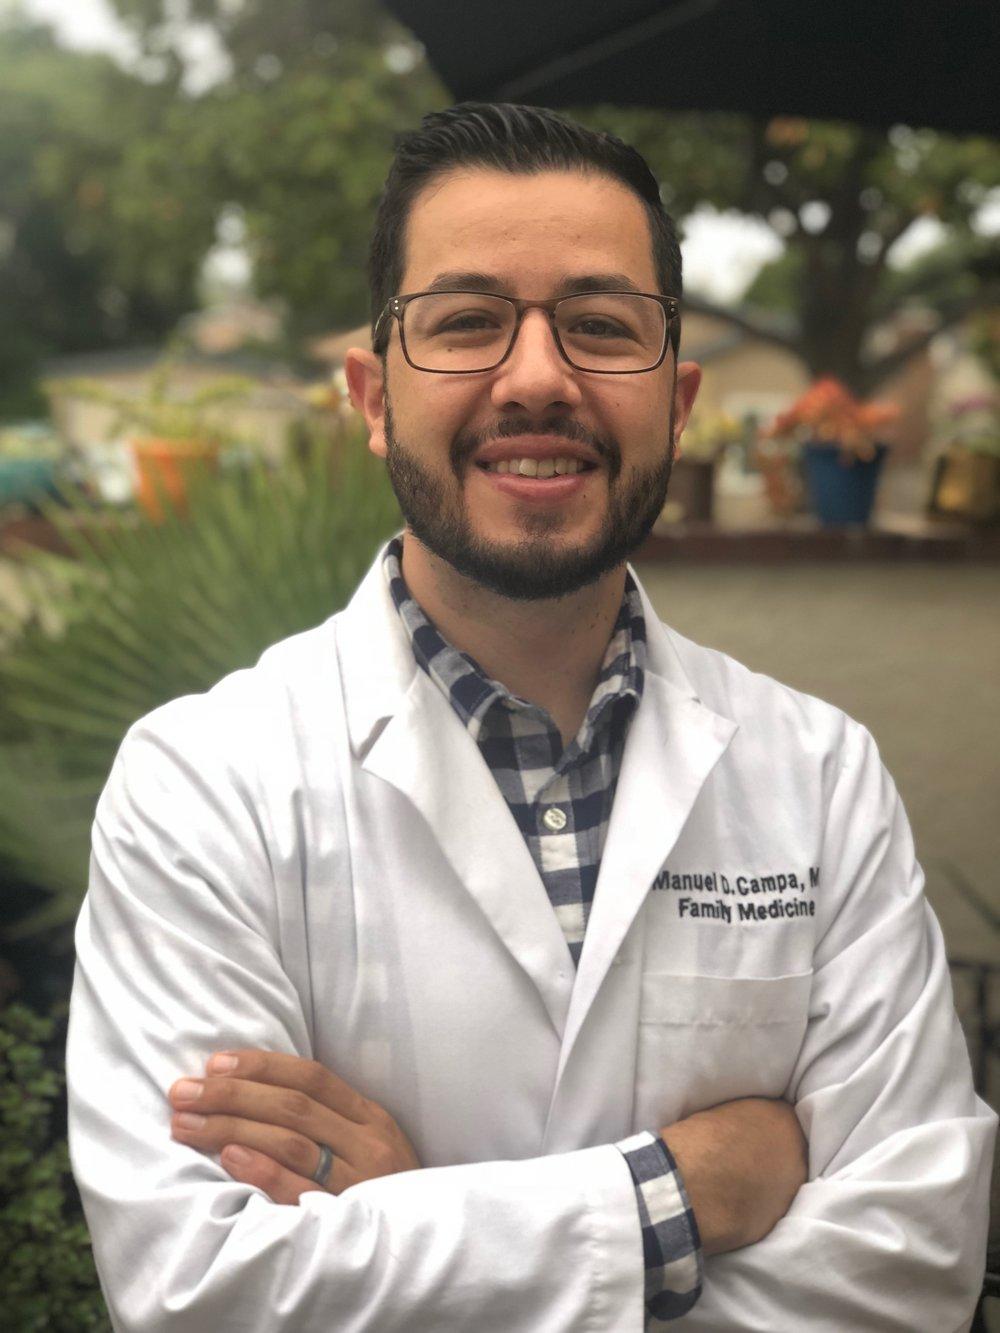 Manuel Campa, MD